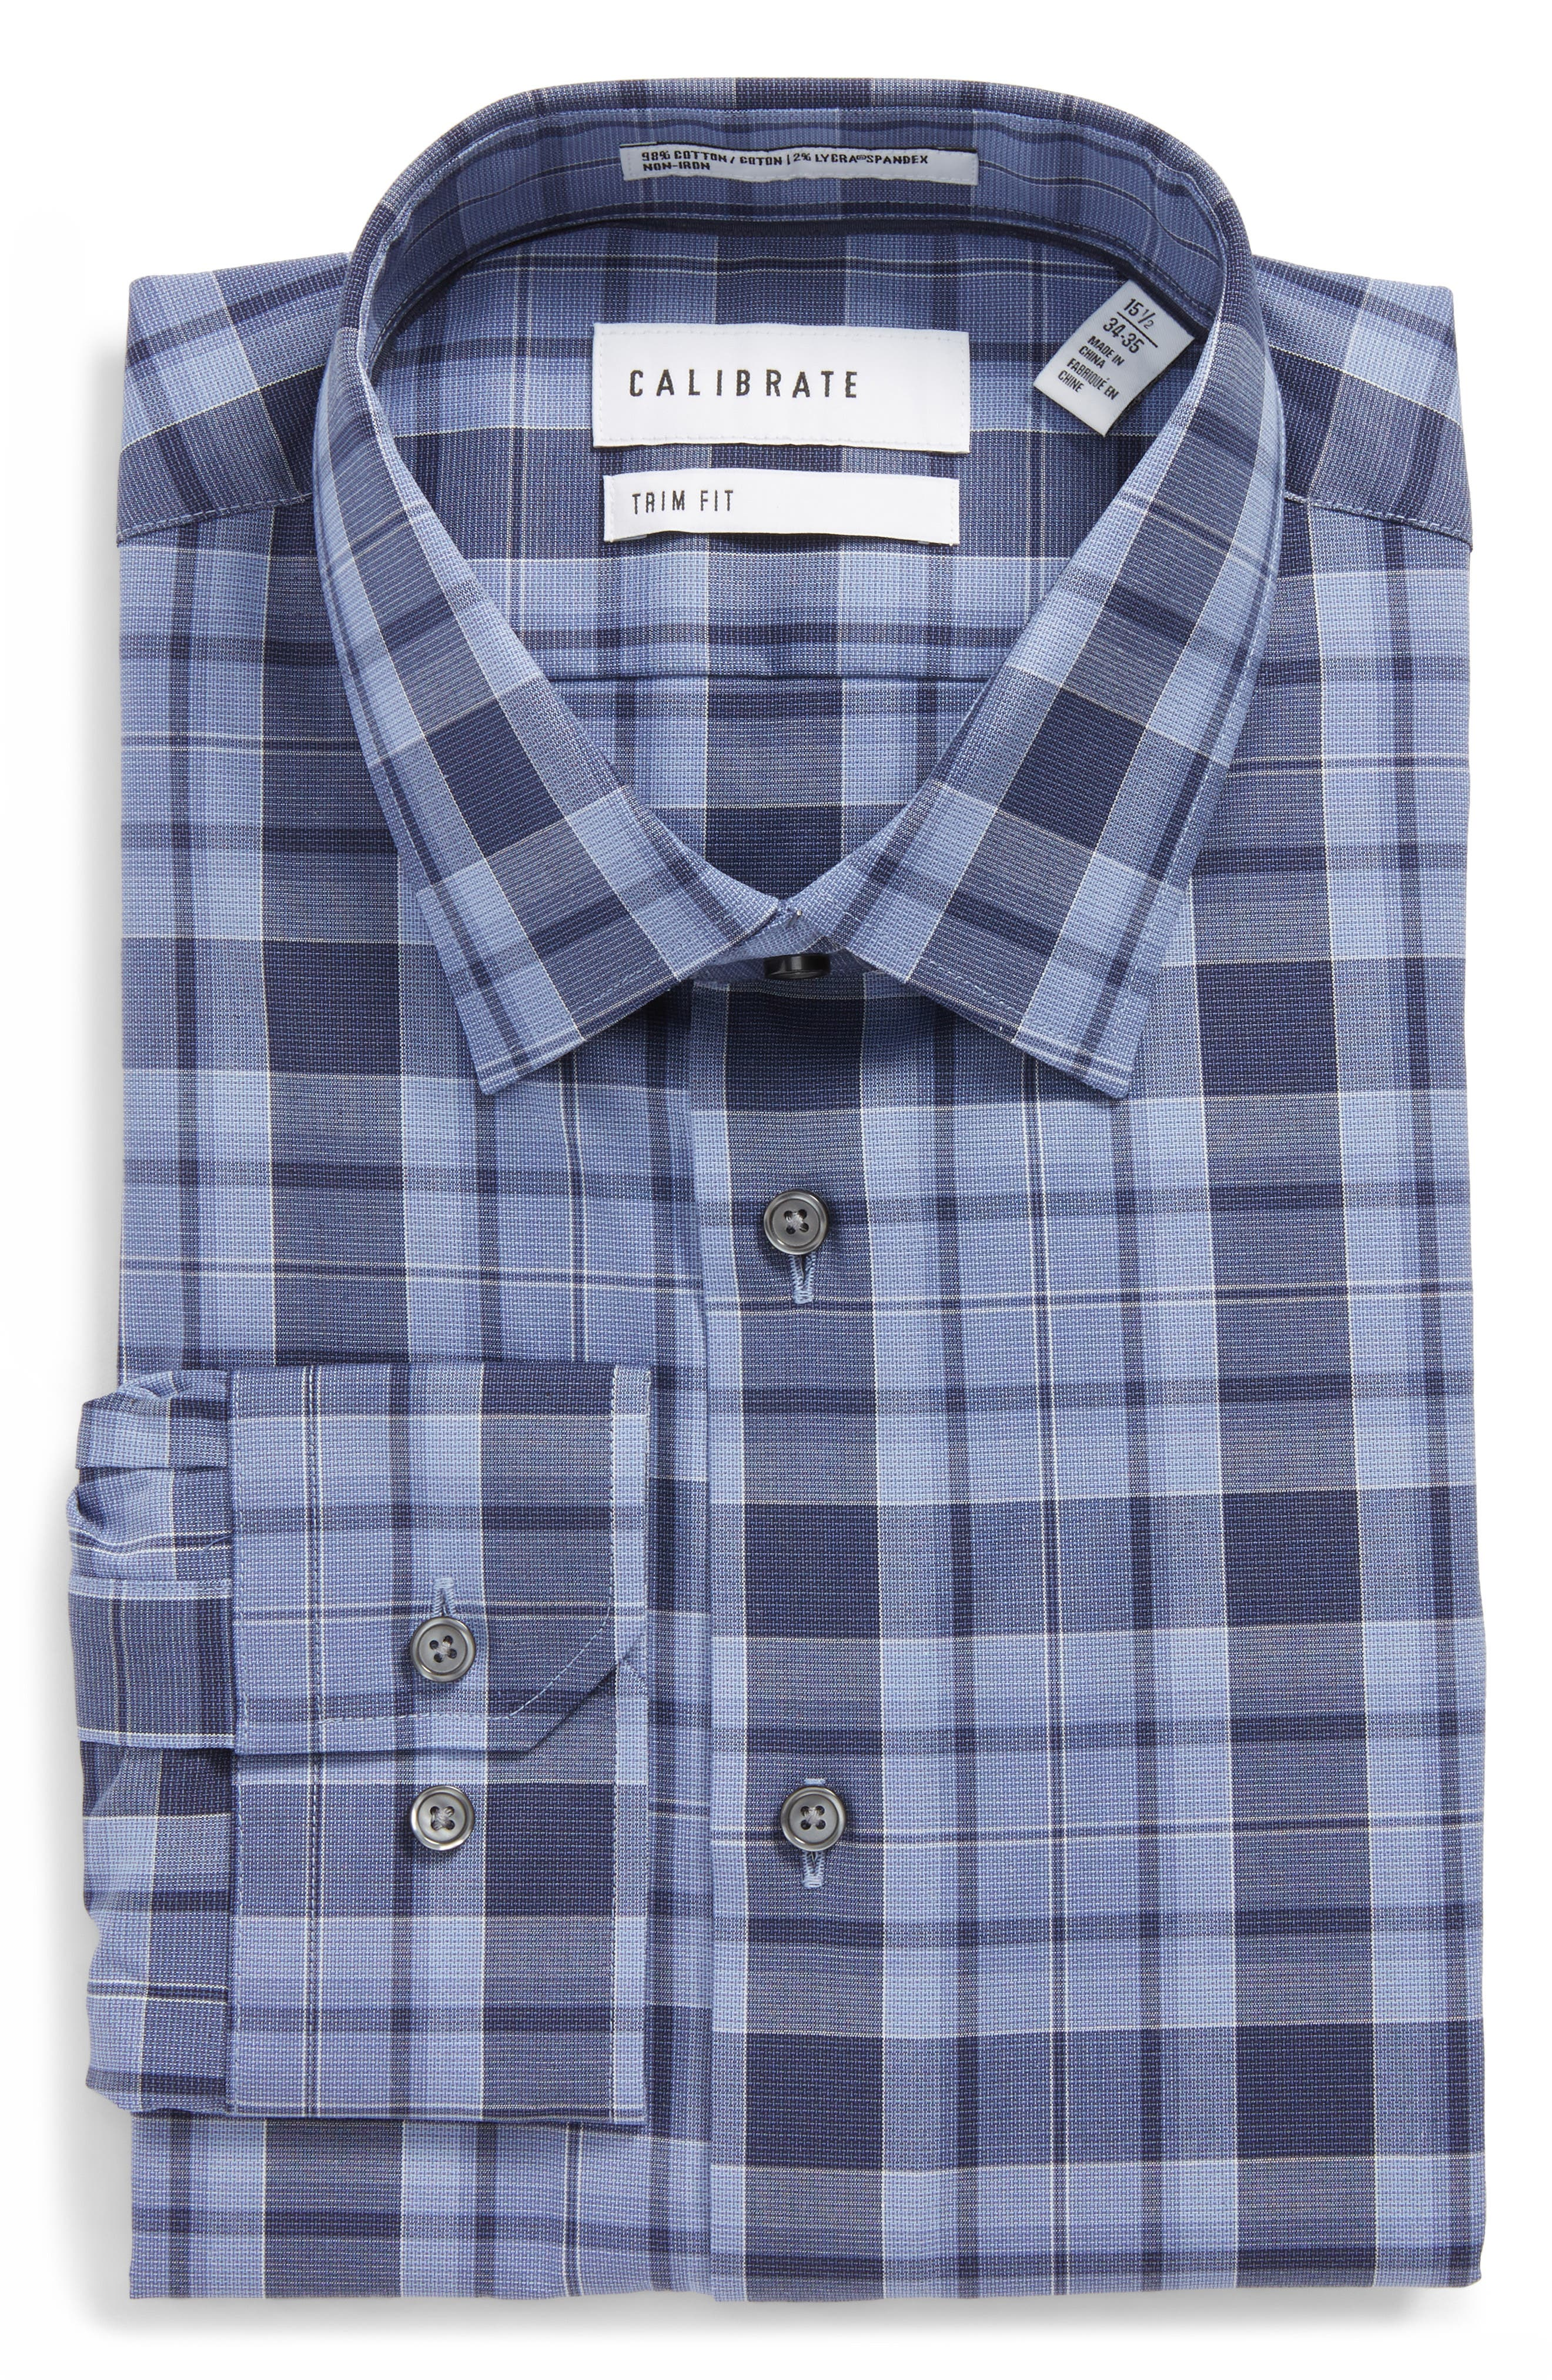 Alternate Image 1 Selected - Calibrate Trim Fit Stretch No-Iron Check Dress Shirt